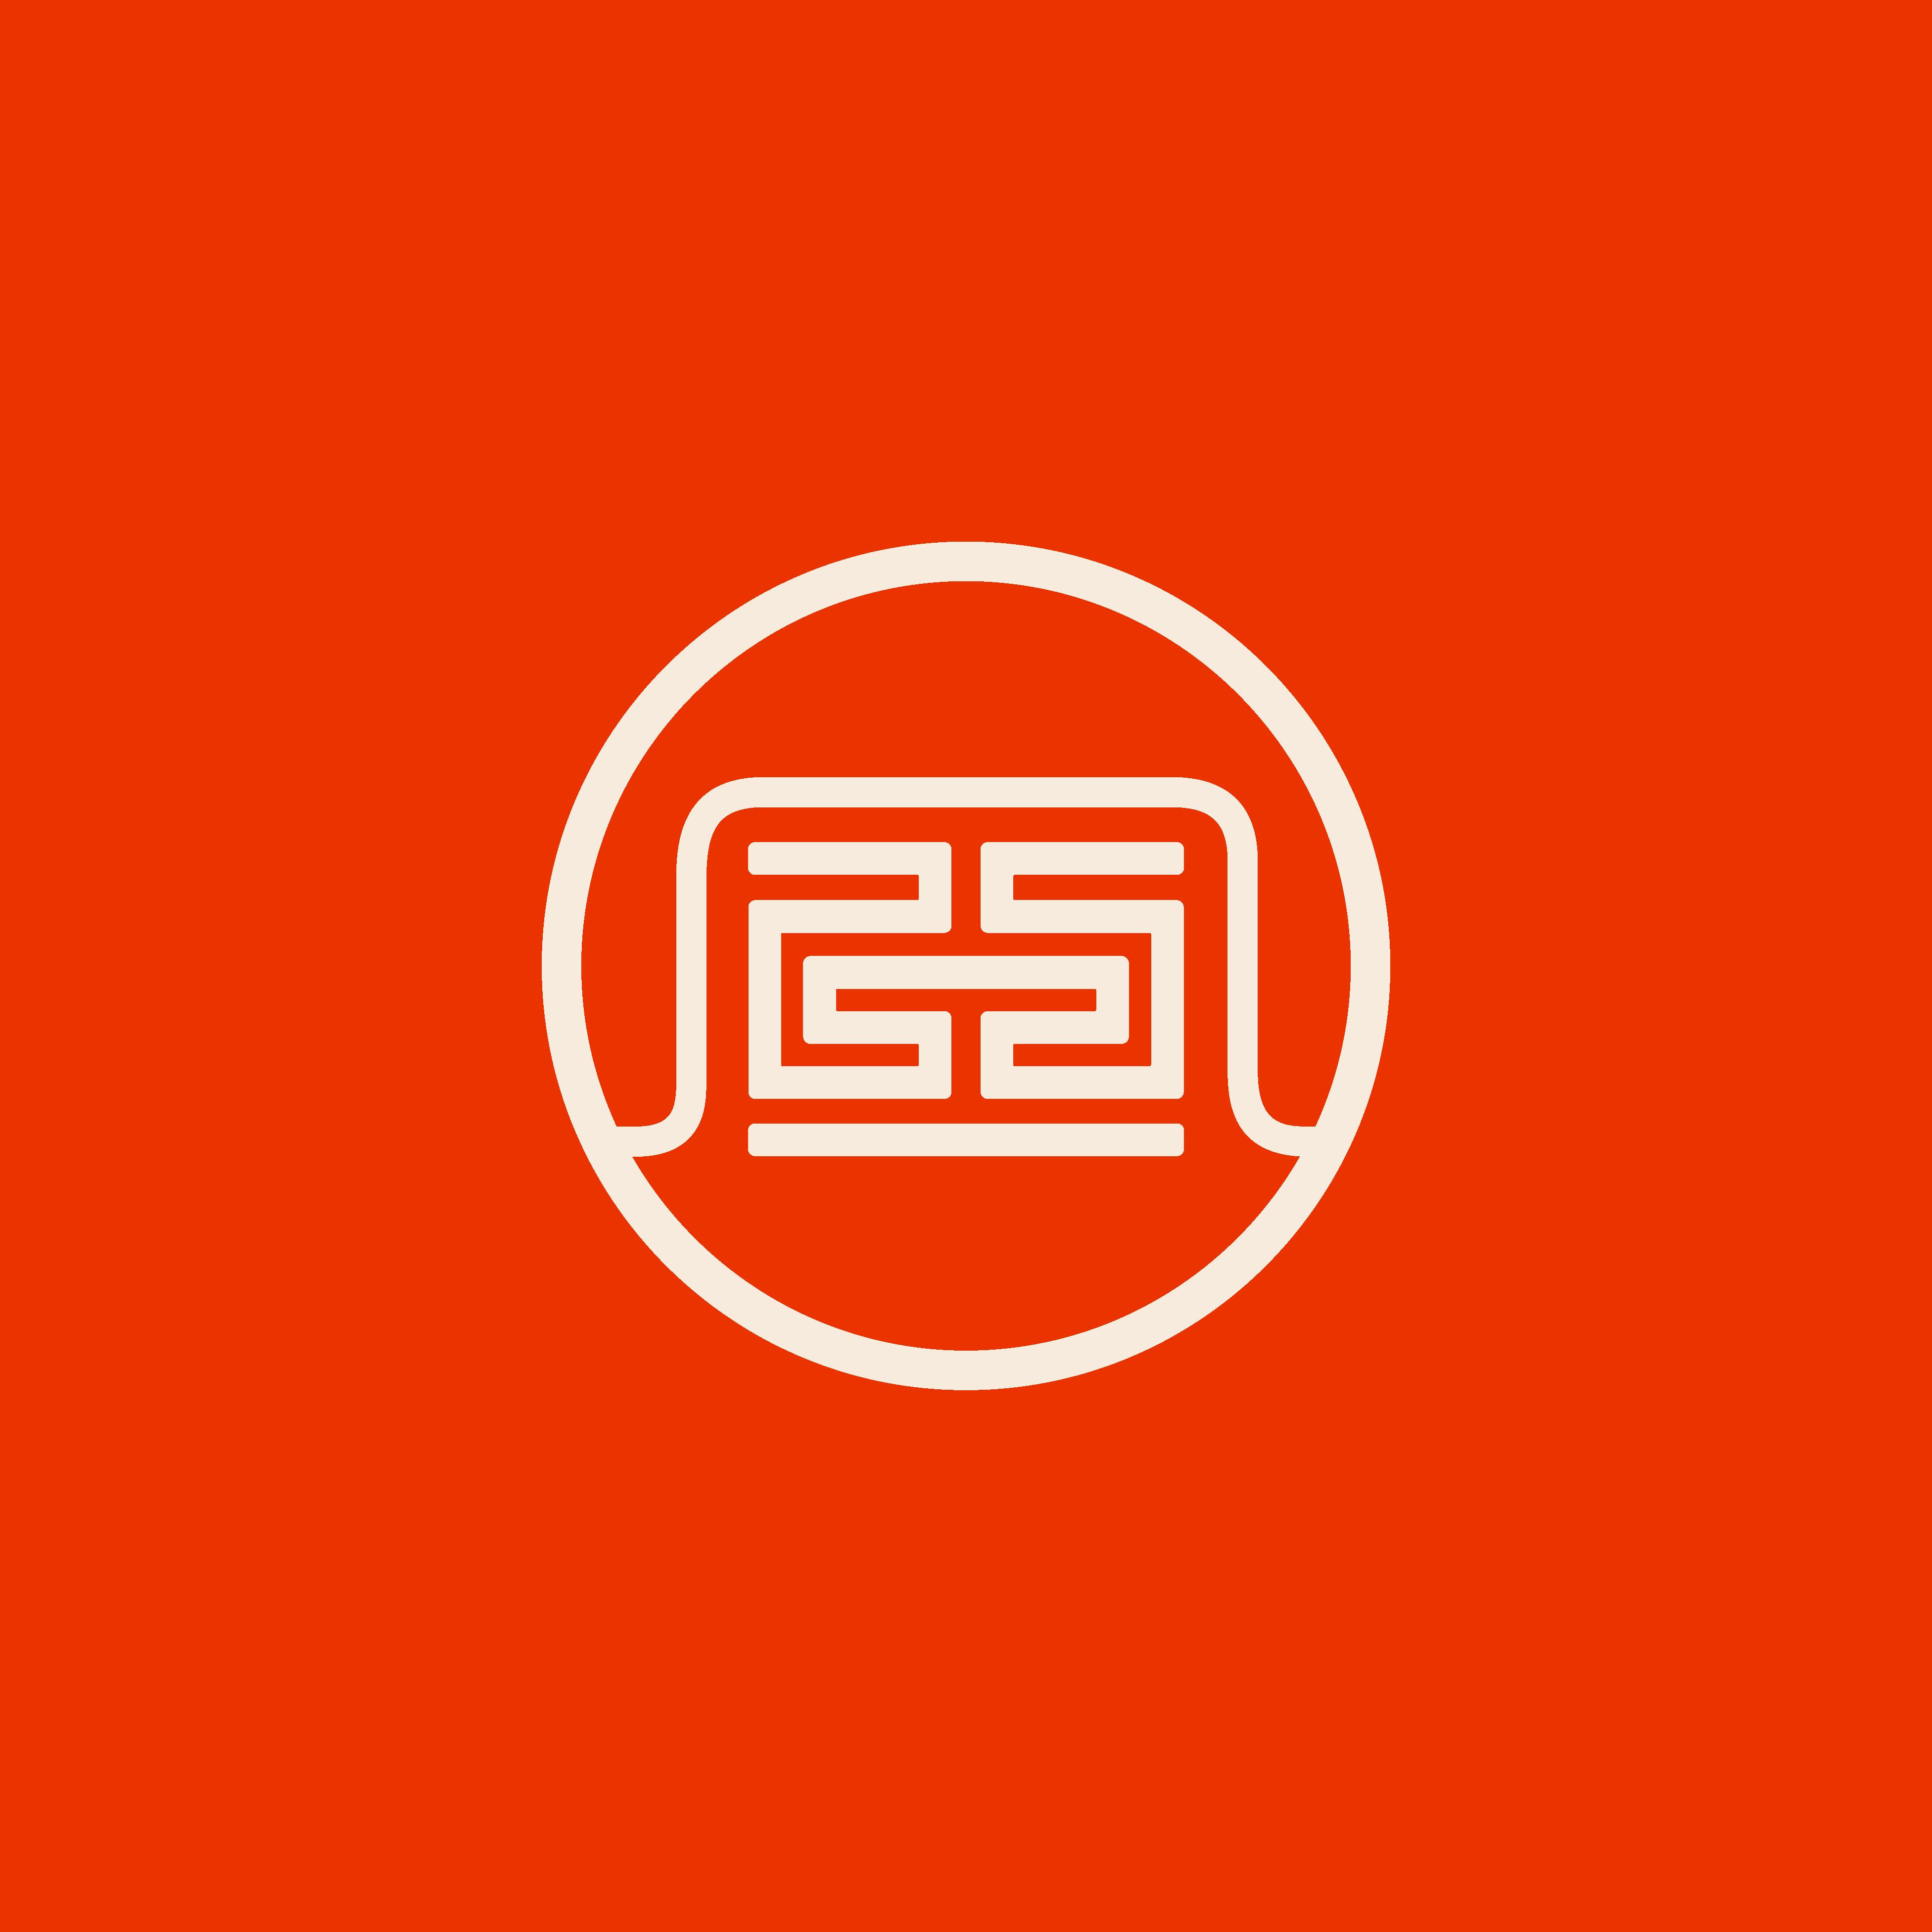 Vermillion Lifestyle Holdings Limited (HK)